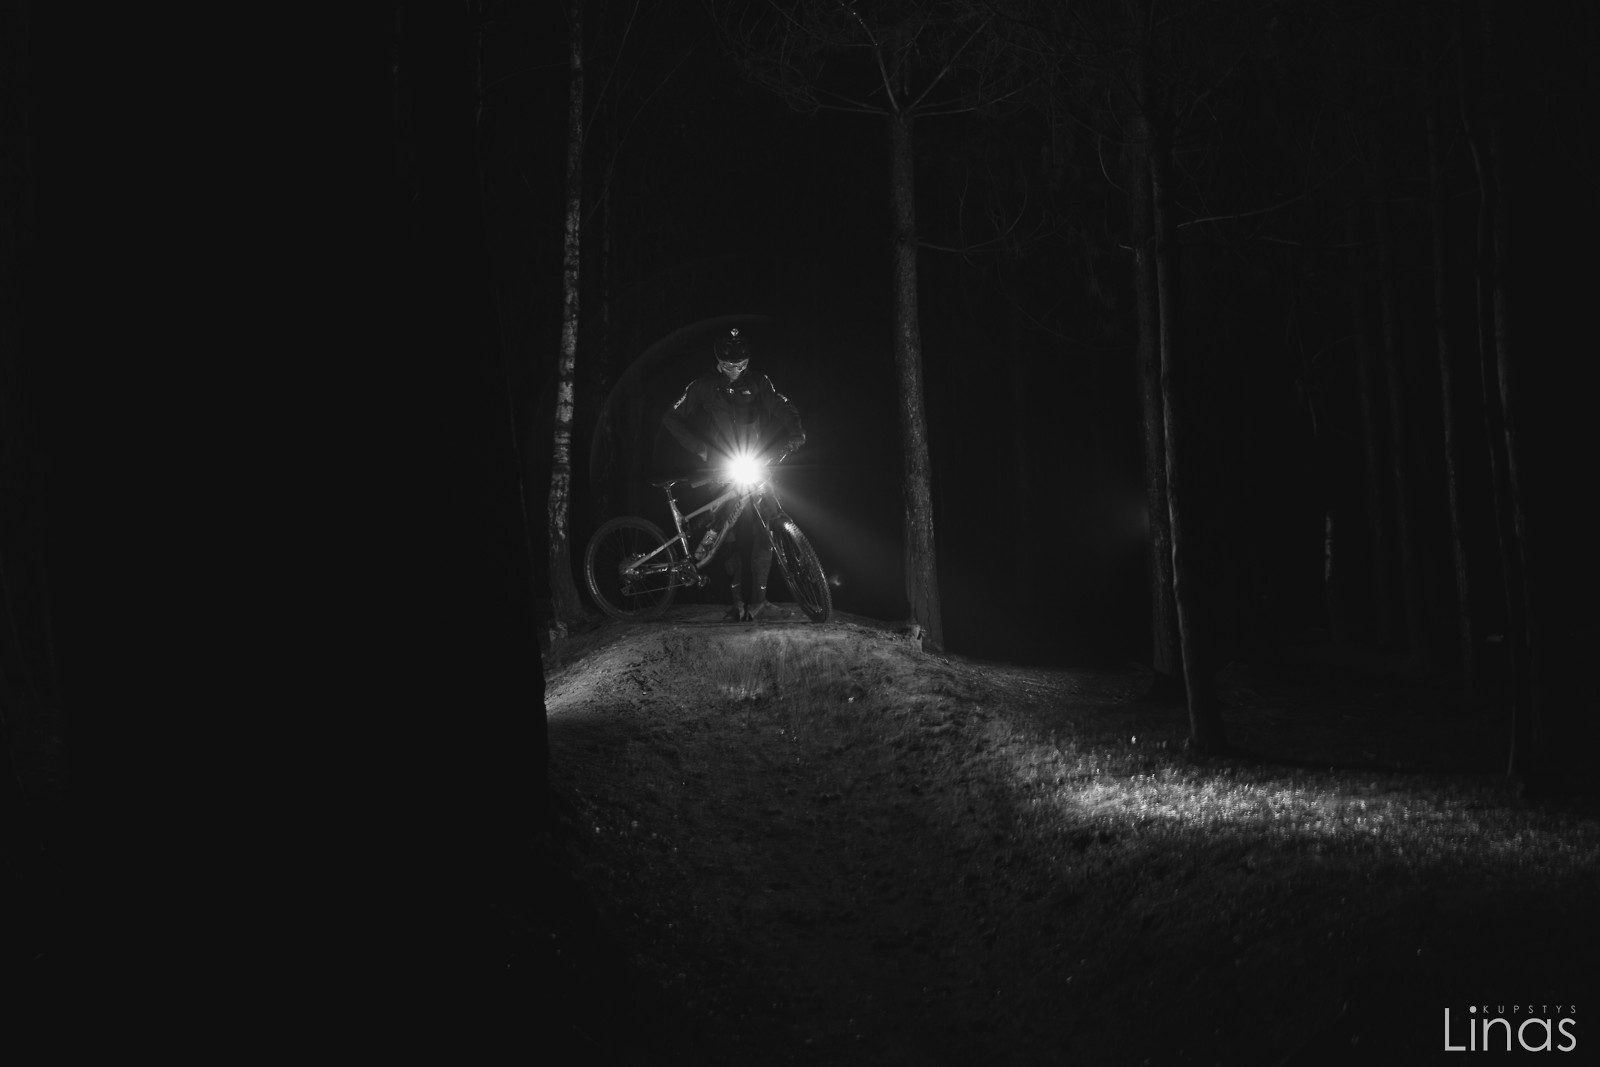 Ckecking... - linask24 - Mountain Biking Pictures - Vital MTB